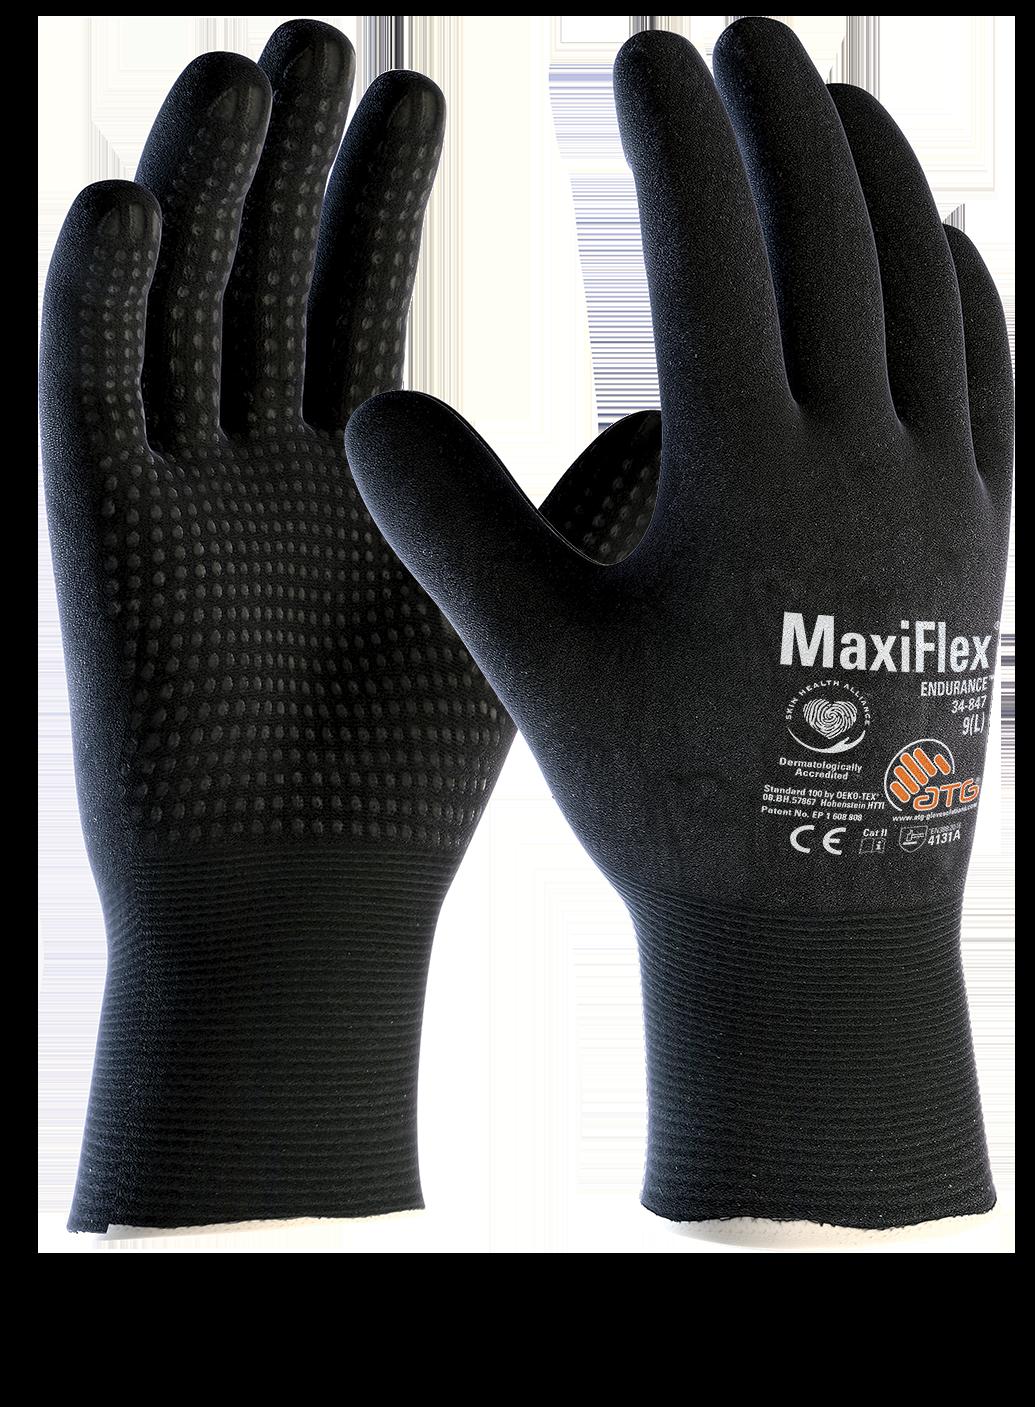 34-847 MaxiFlex® Endurance™ Drivers Style Knitwrist Image